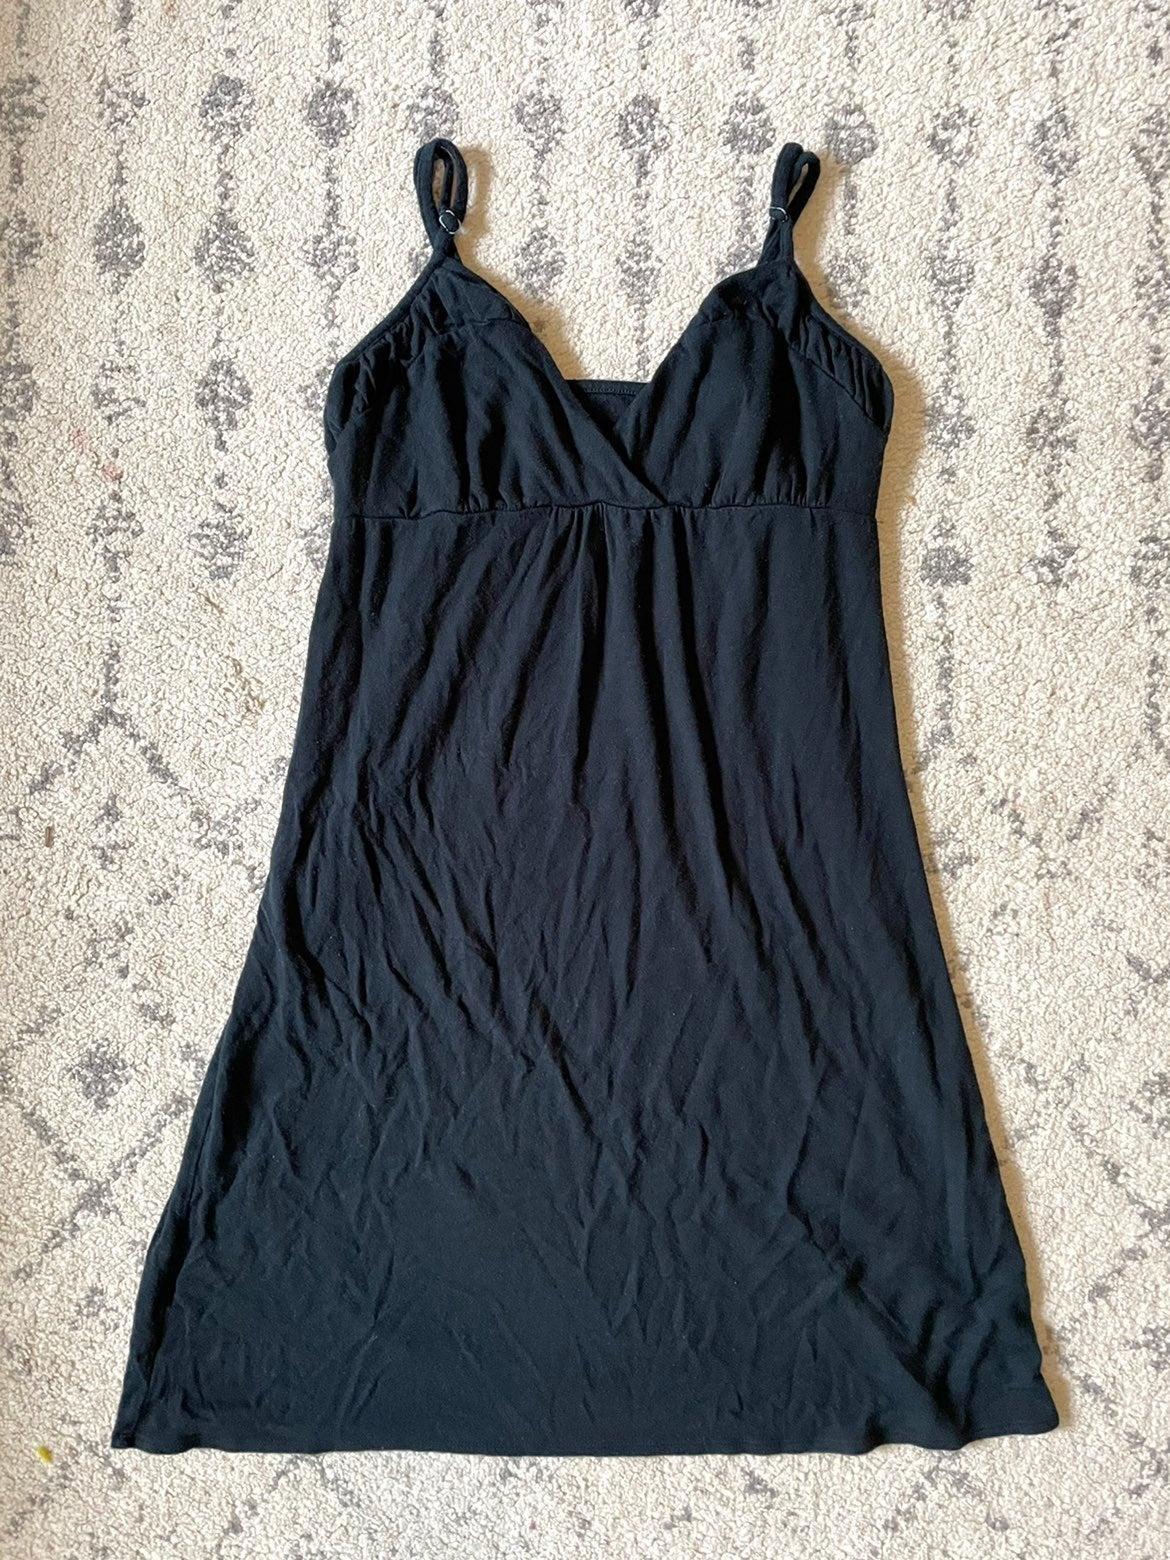 Target Sleepwear Nightgown